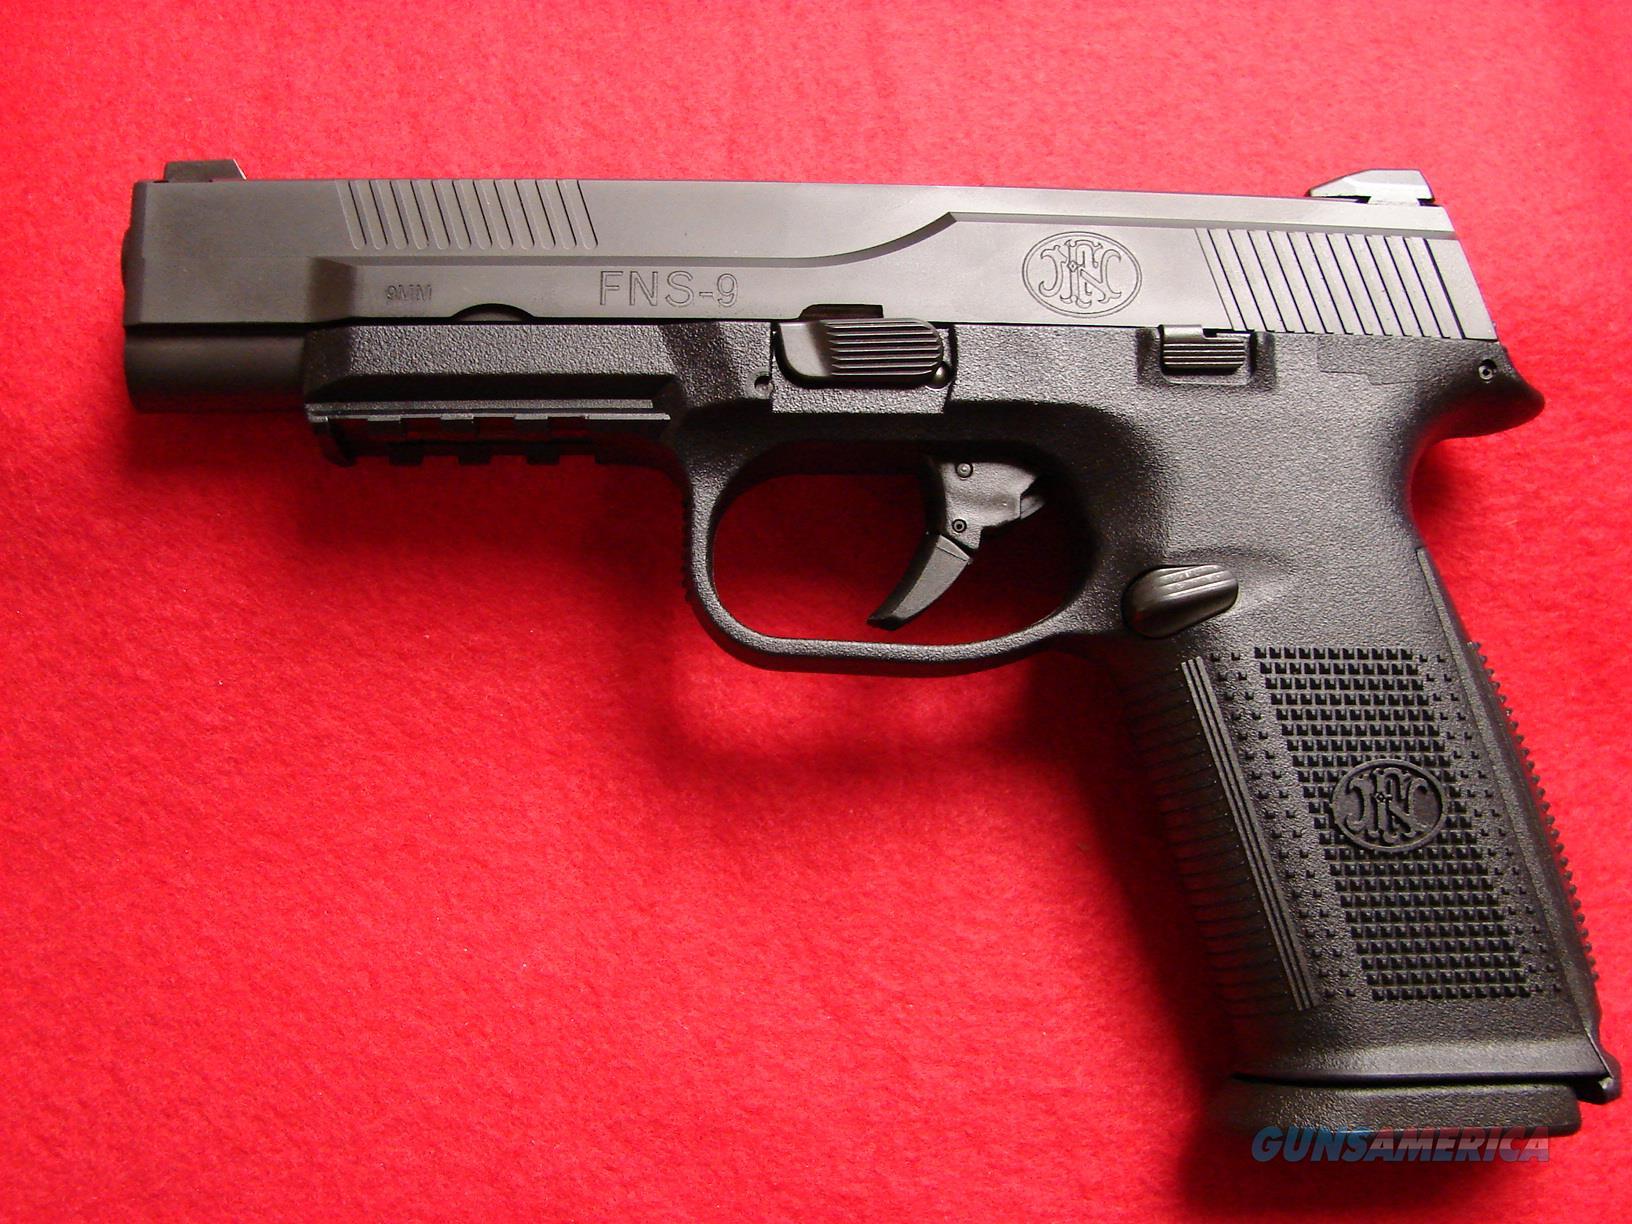 "FN - FNS 9 - 9mm - ""Target Long Slide"" 17rd - 3-mags - Black - NIB  Guns > Pistols > FNH - Fabrique Nationale (FN) Pistols > FNS"